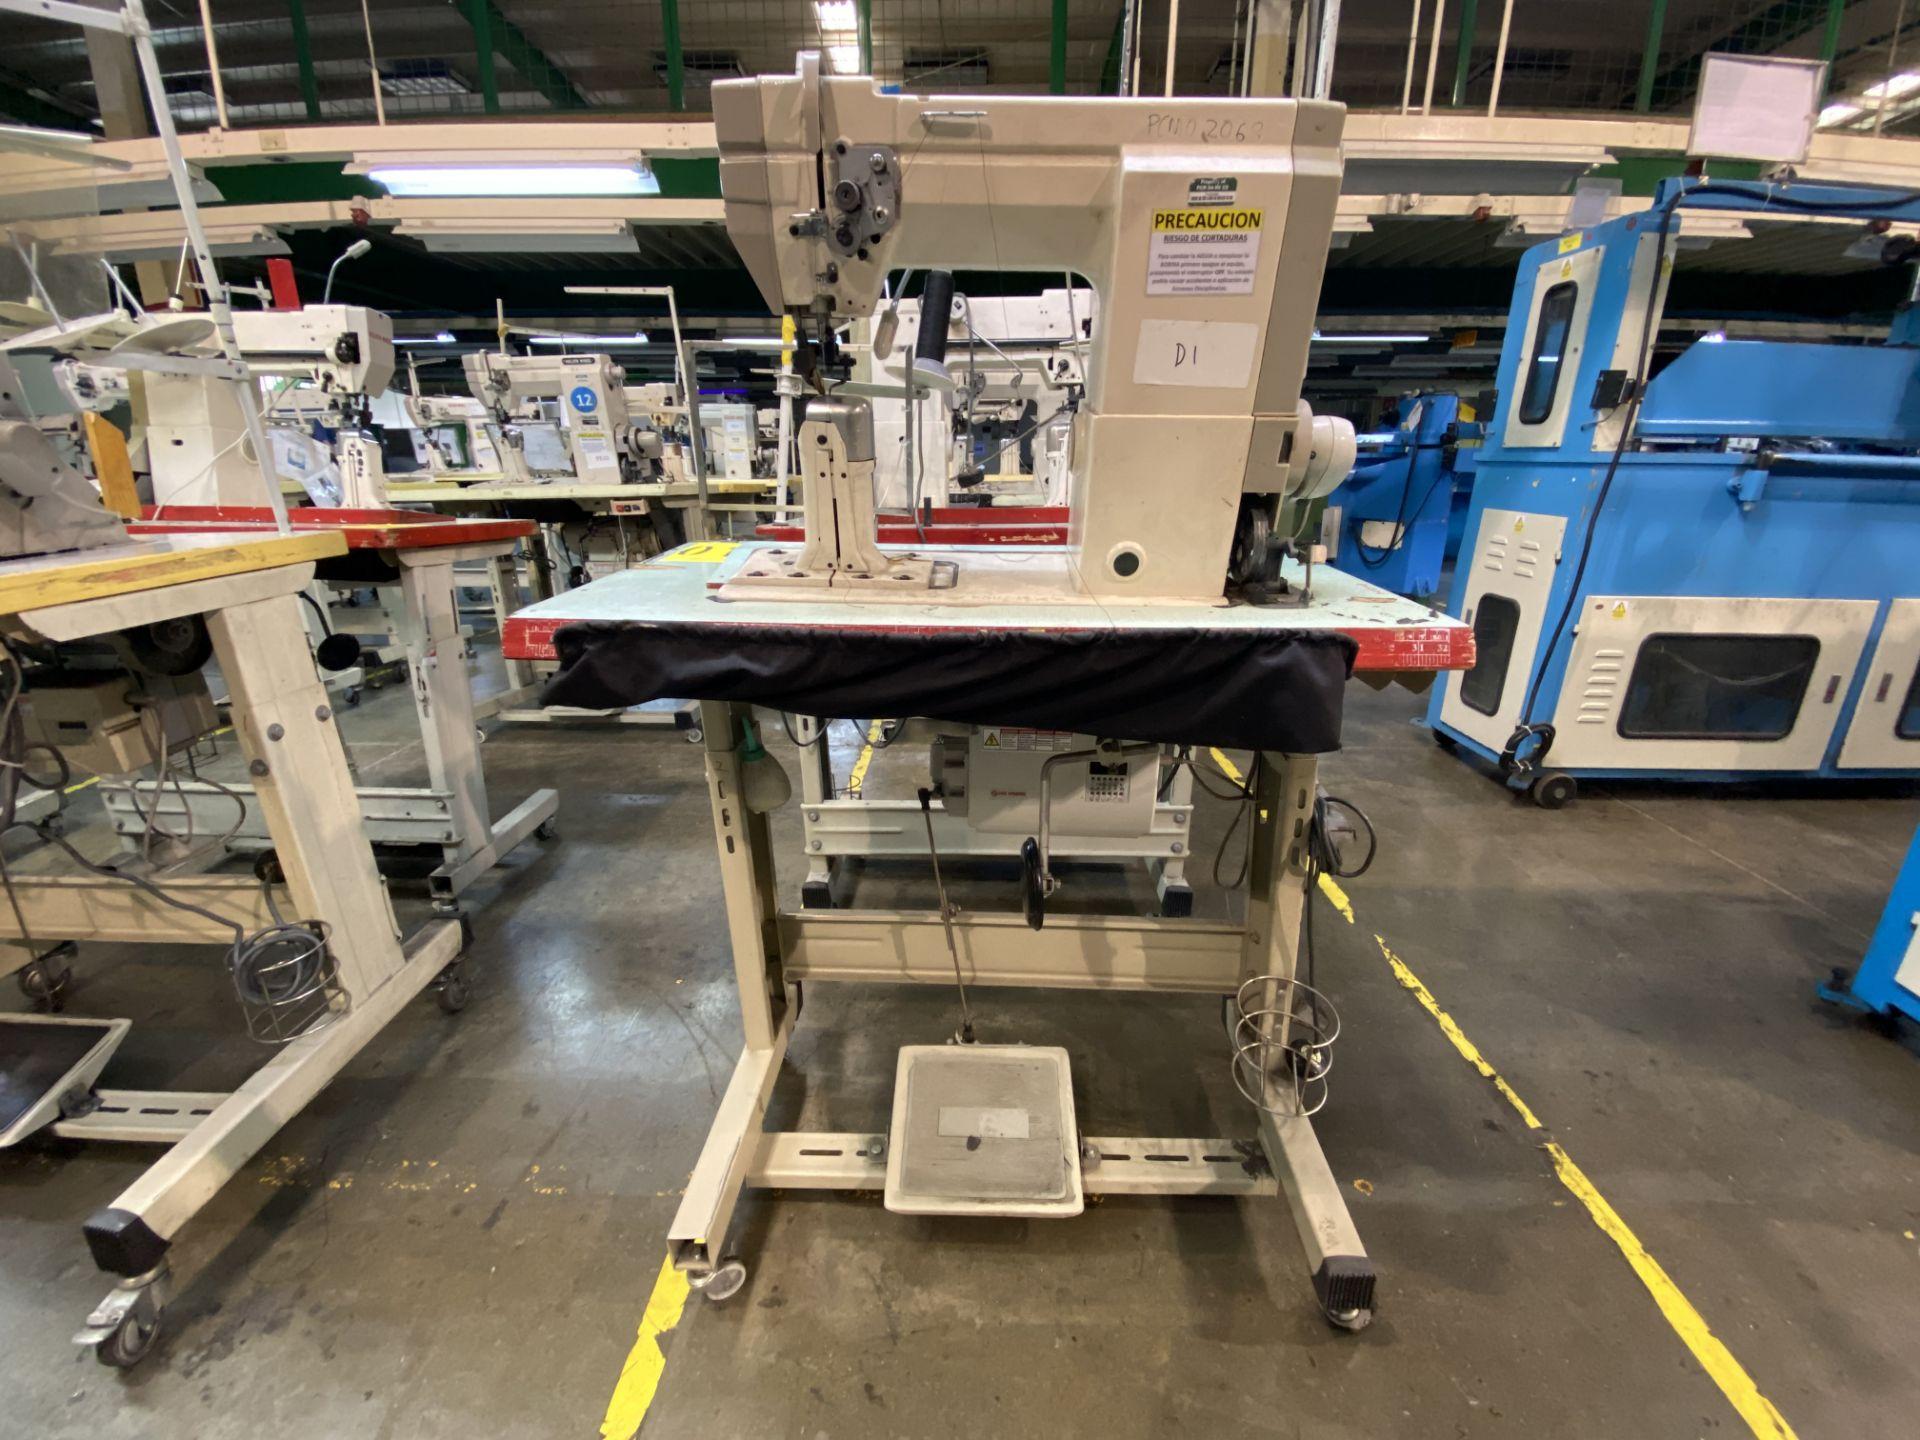 Lot 1 - (2) Máquinas de costura marca Golden Wheel de una aguja.